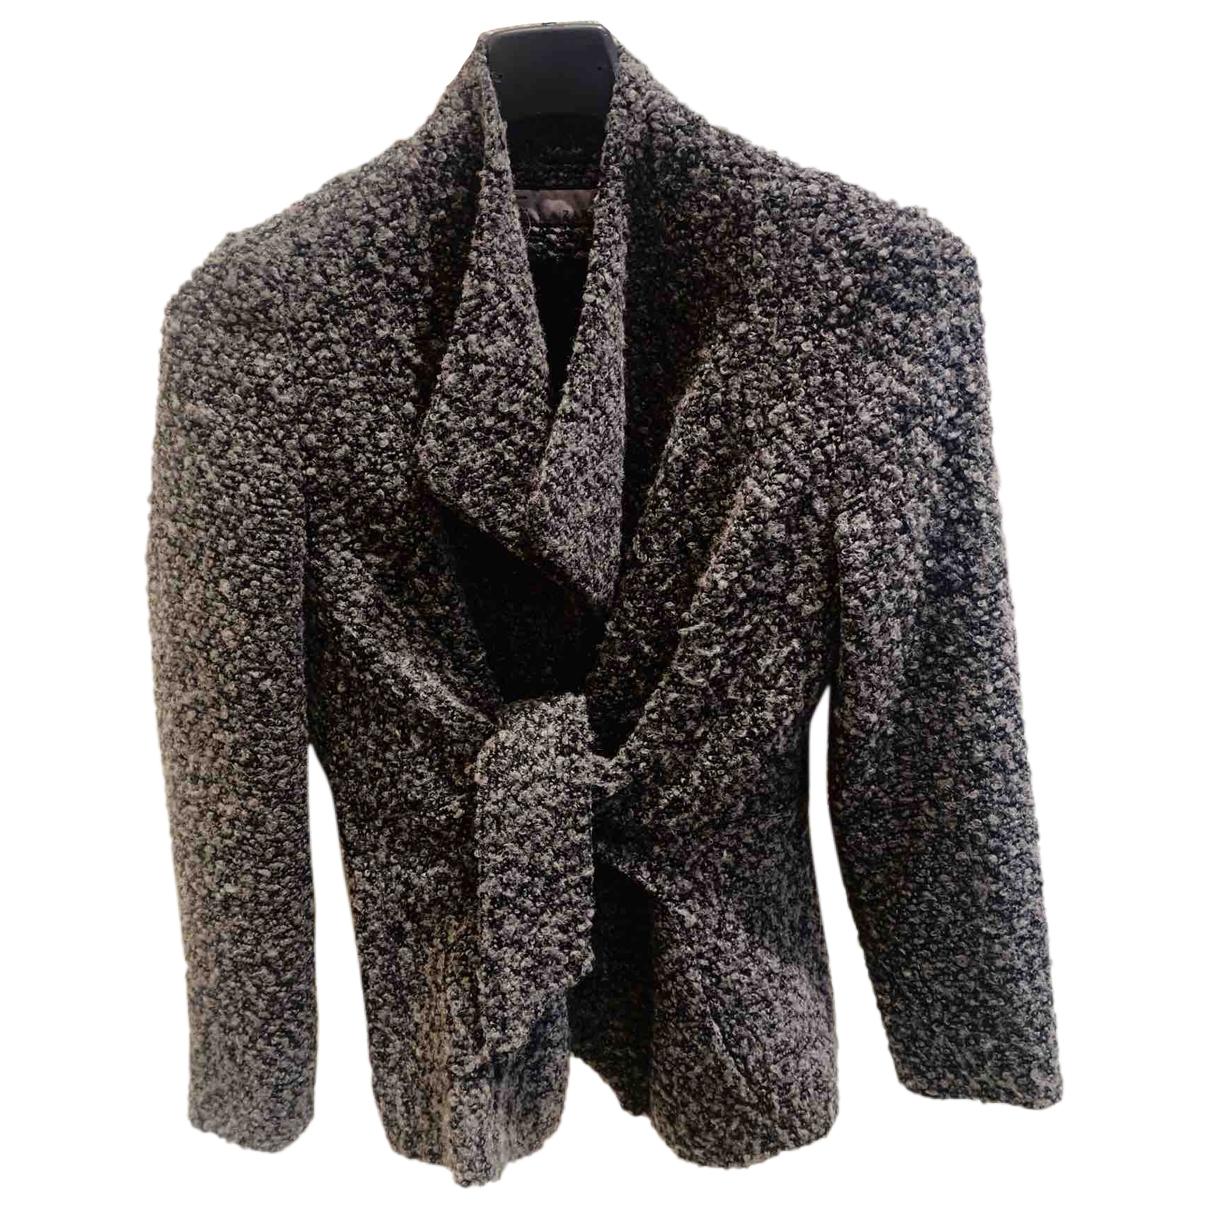 Zara \N Jacke in  Anthrazit Wolle